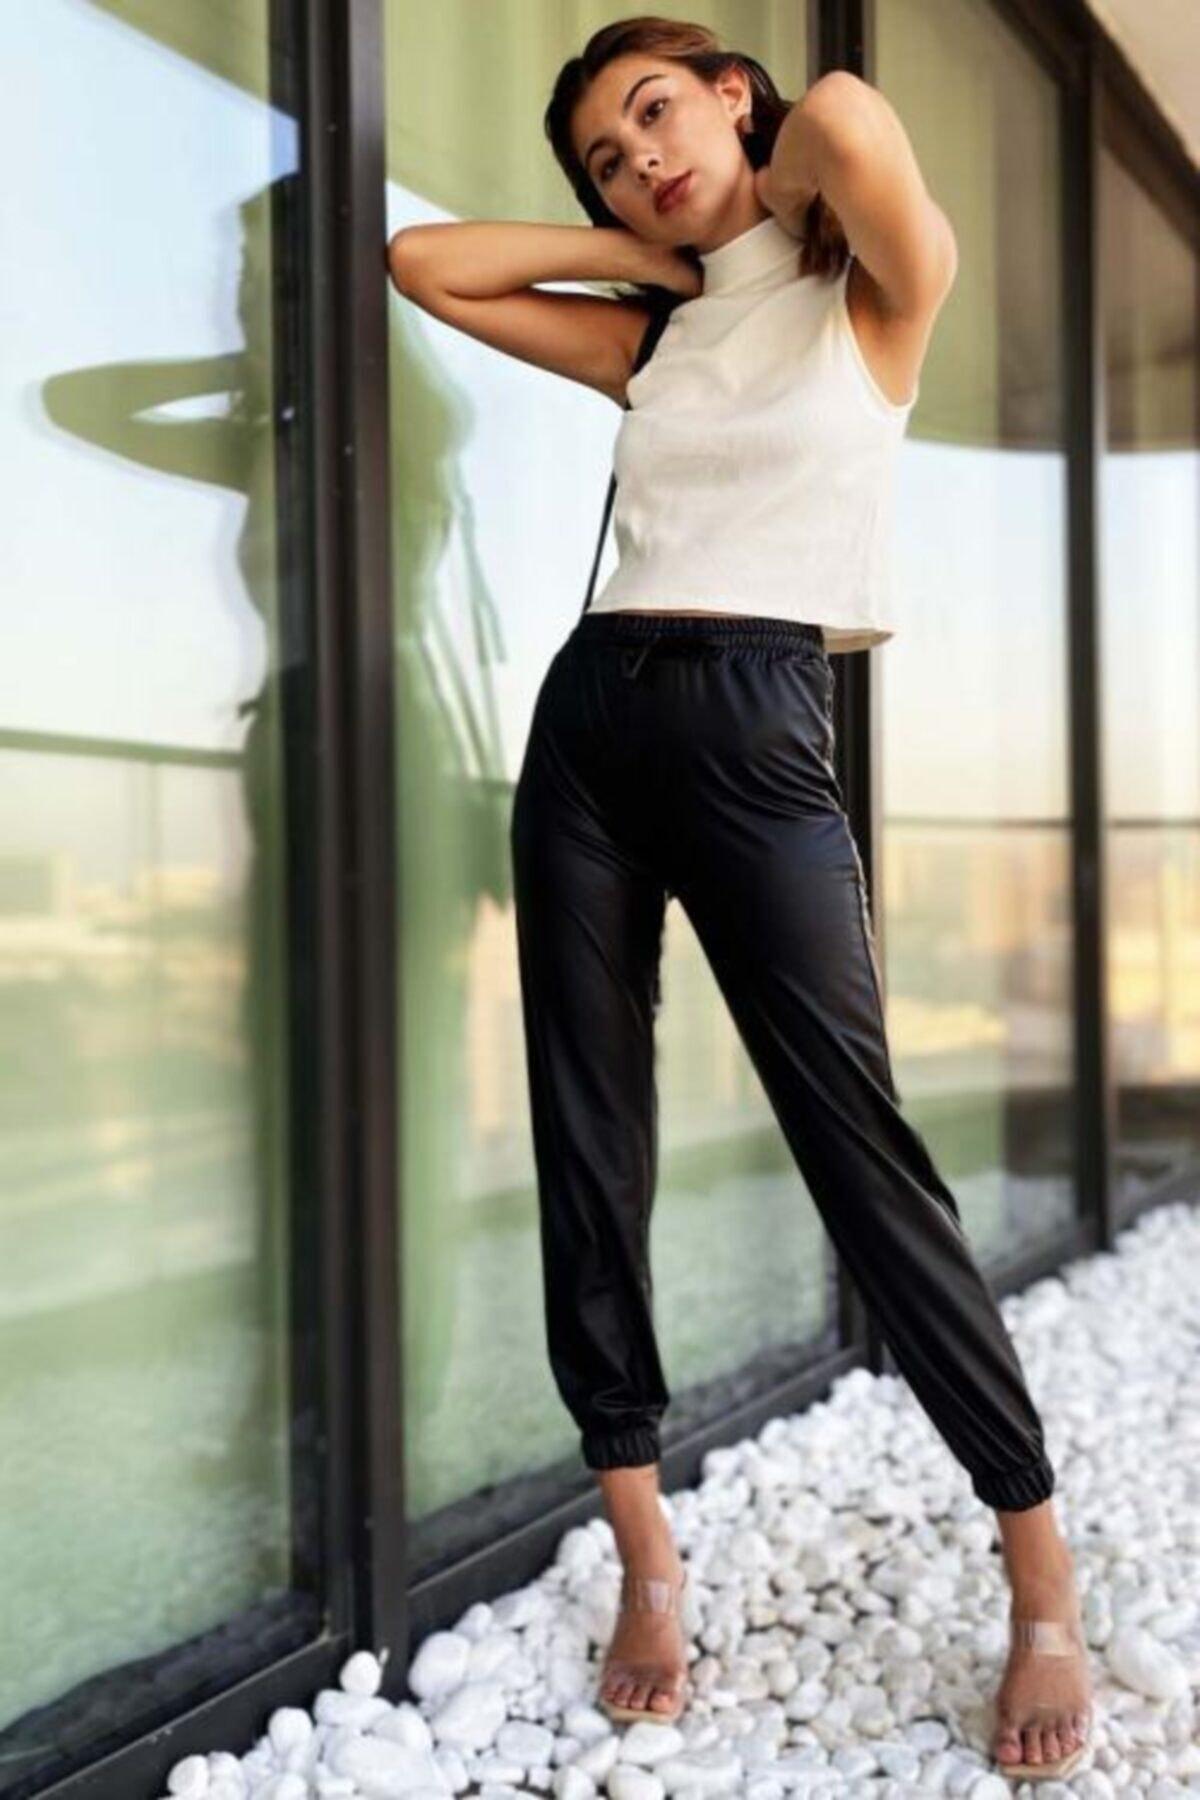 PUCKA FASHION Kadın Siyah Beli Ve Paçası Lastikli Deri Jogger Pantolon 1